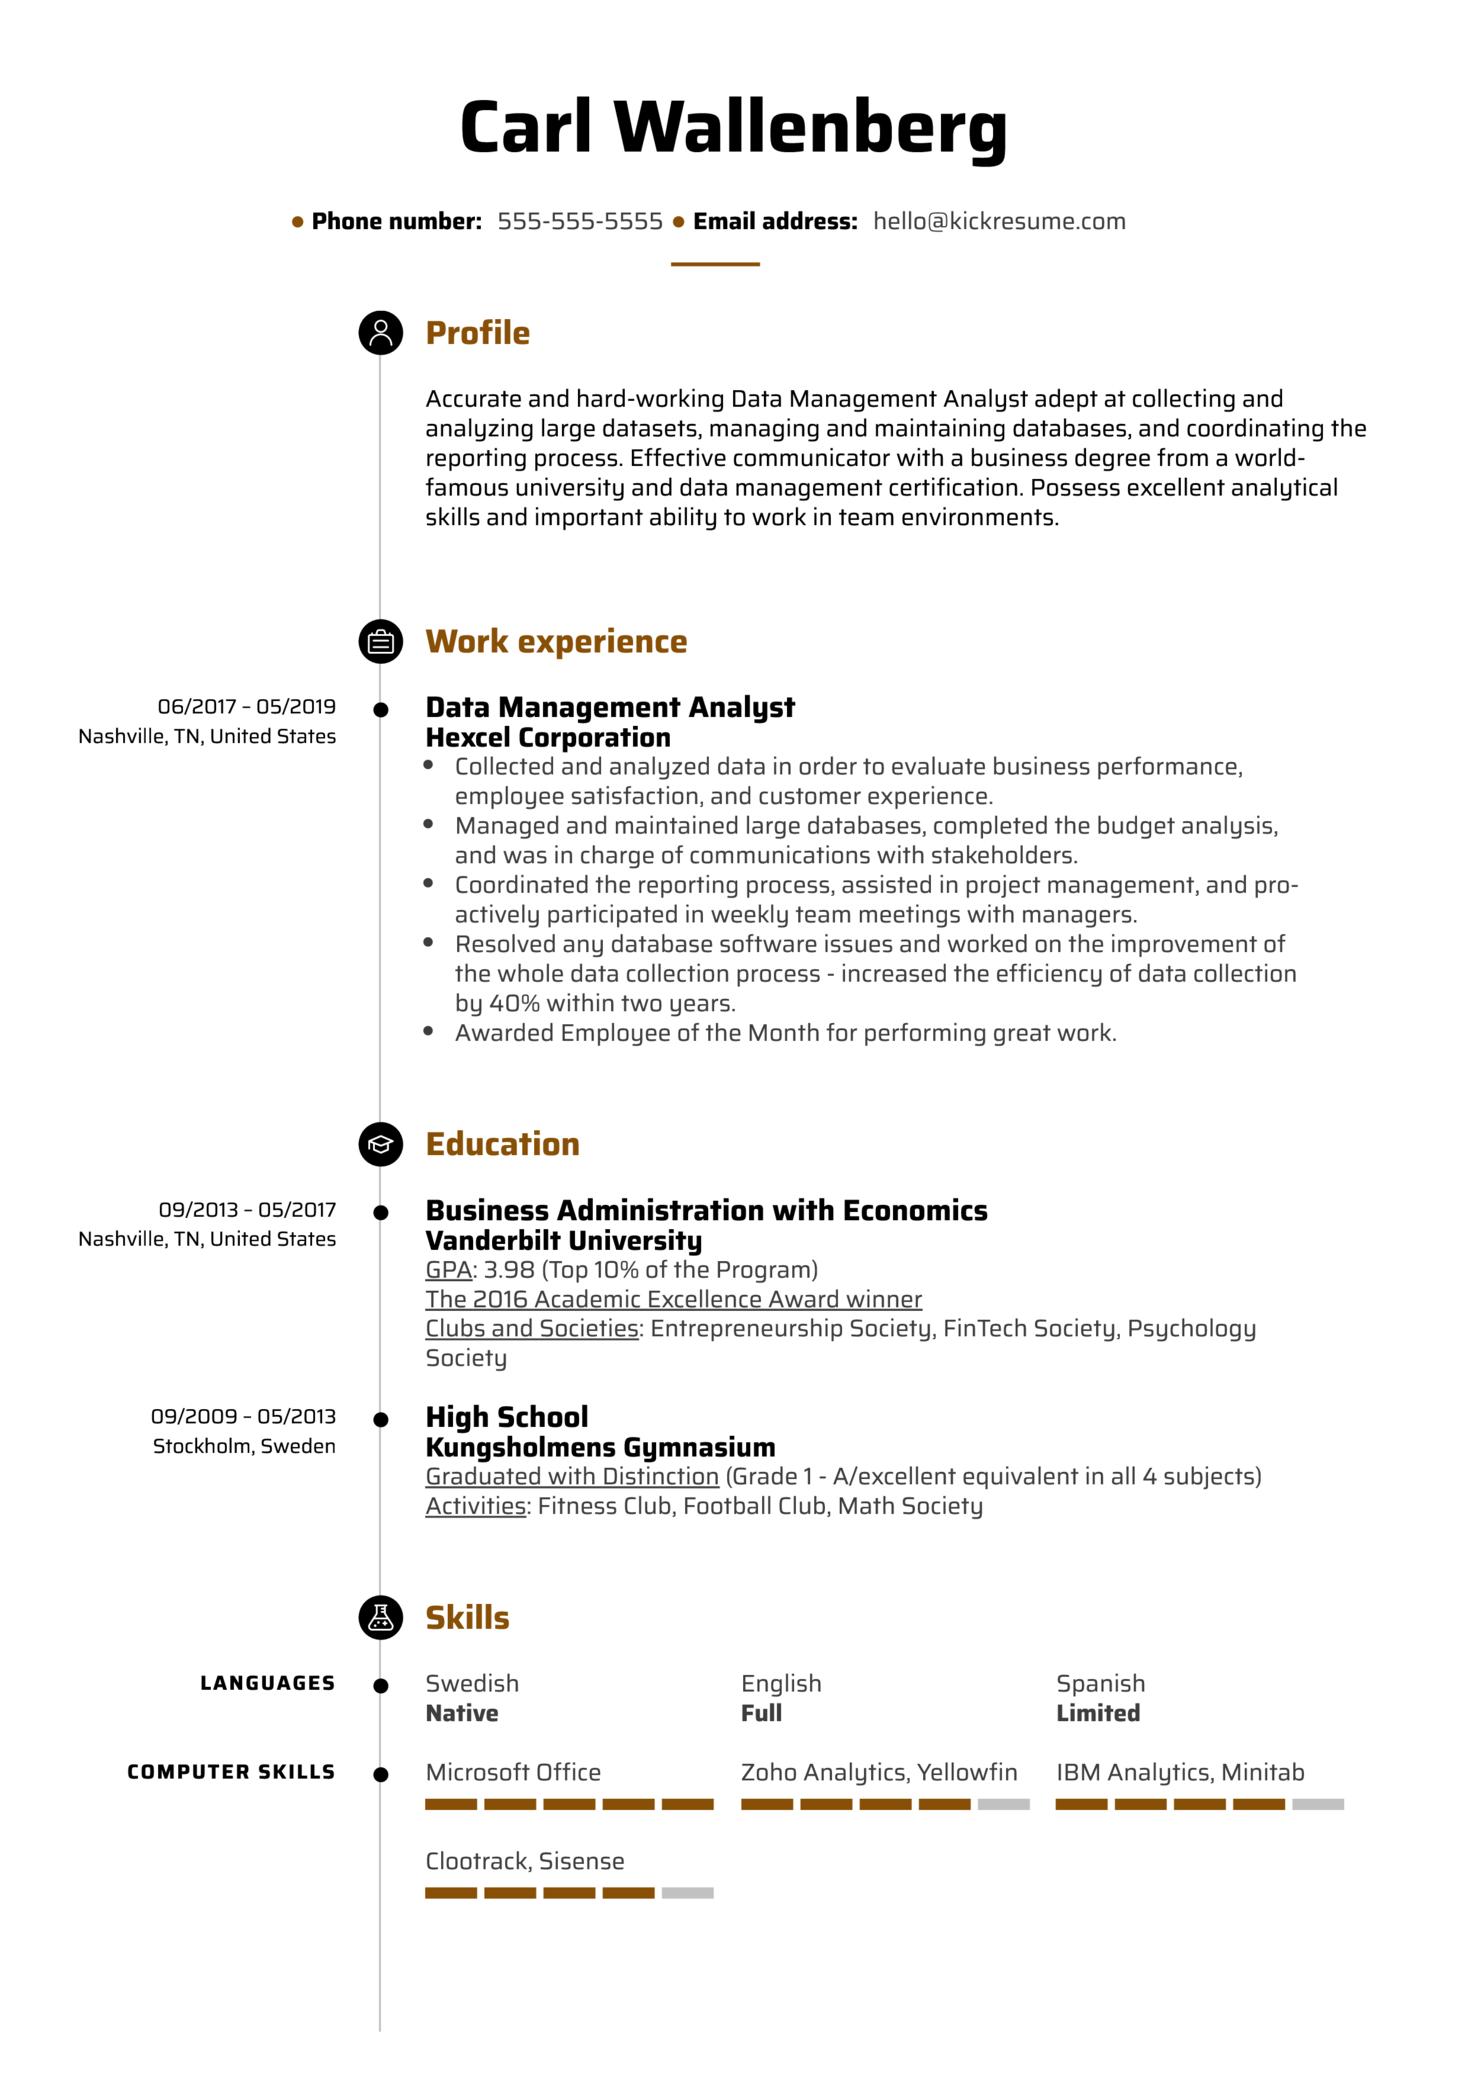 Data Management Analyst Resume Example (Part 1)